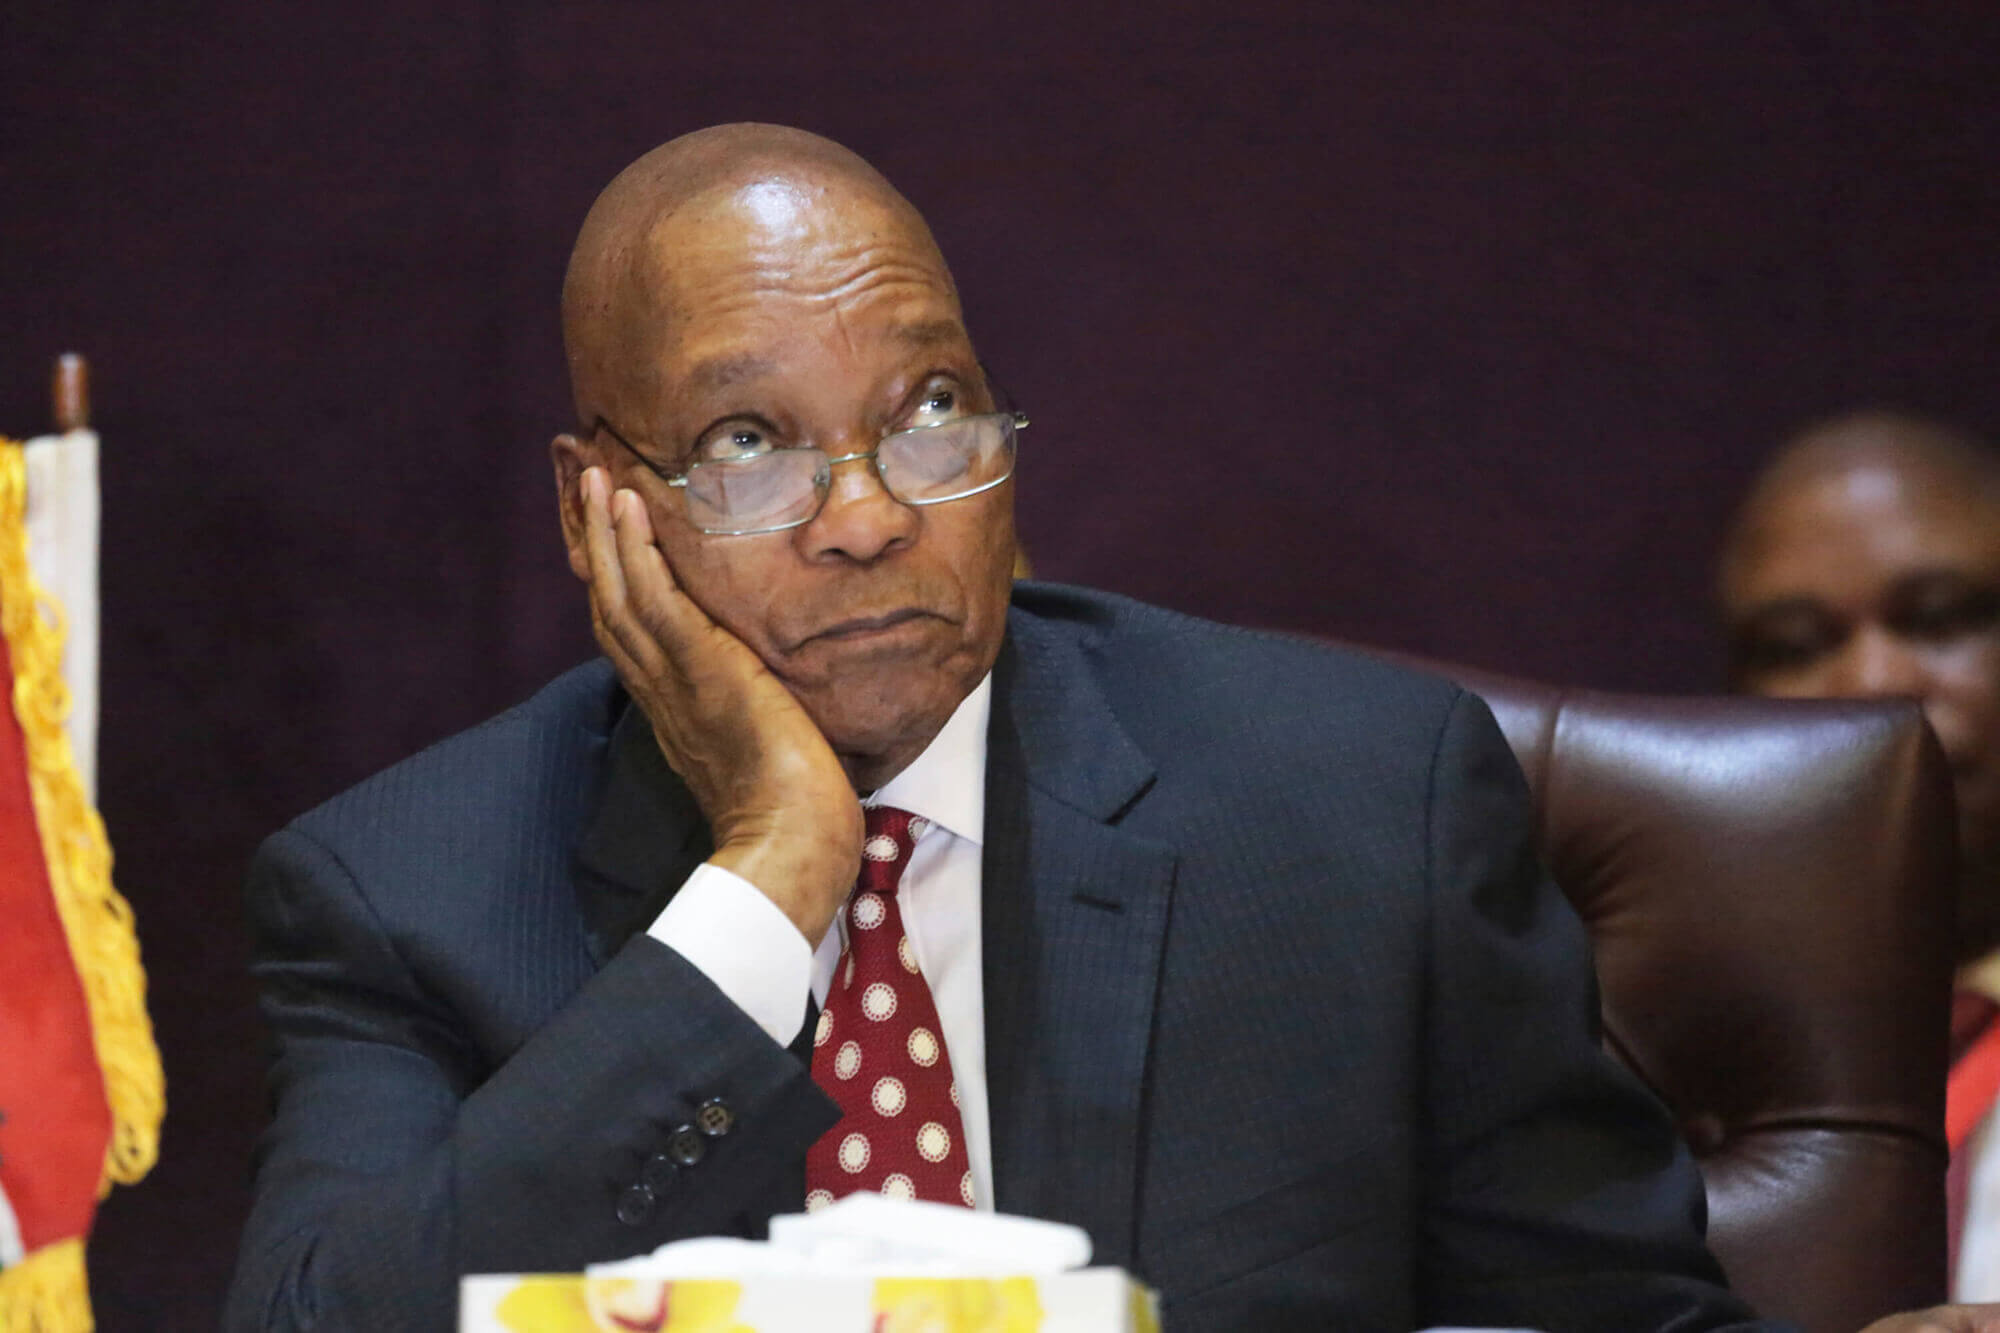 November 2016: South African President Zuma Survives Third No-Confidence Vote